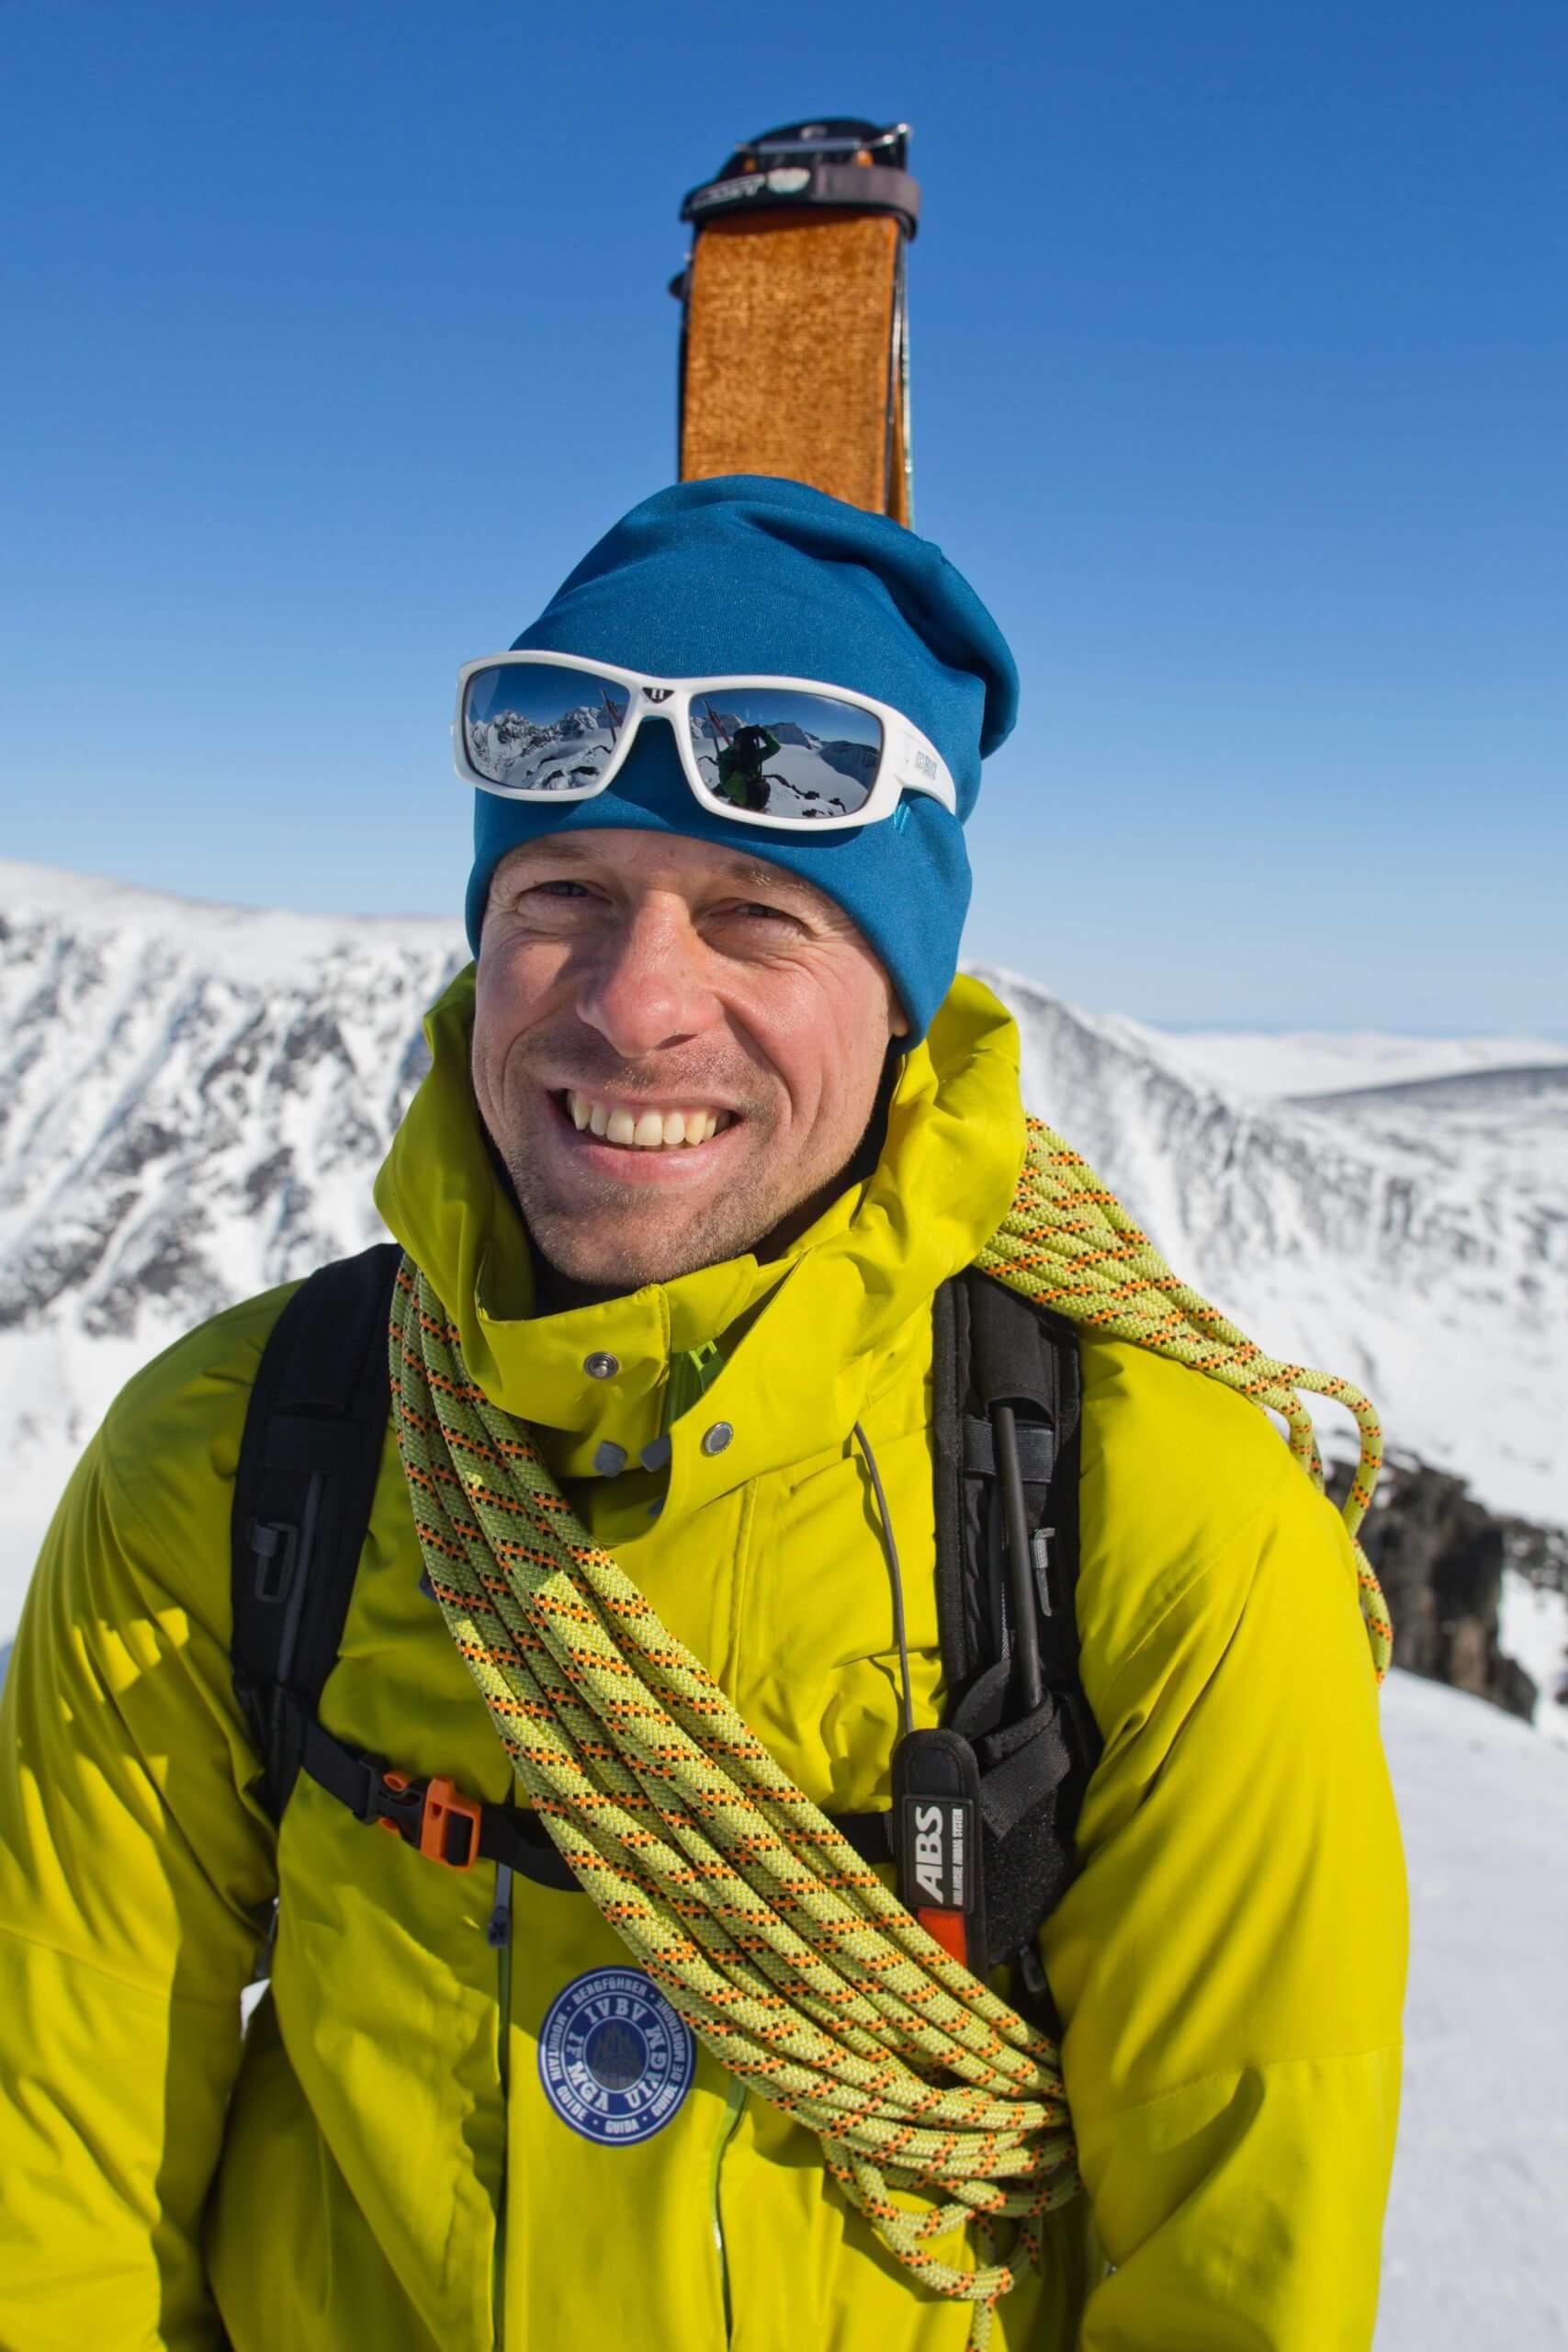 Carl Lundberg